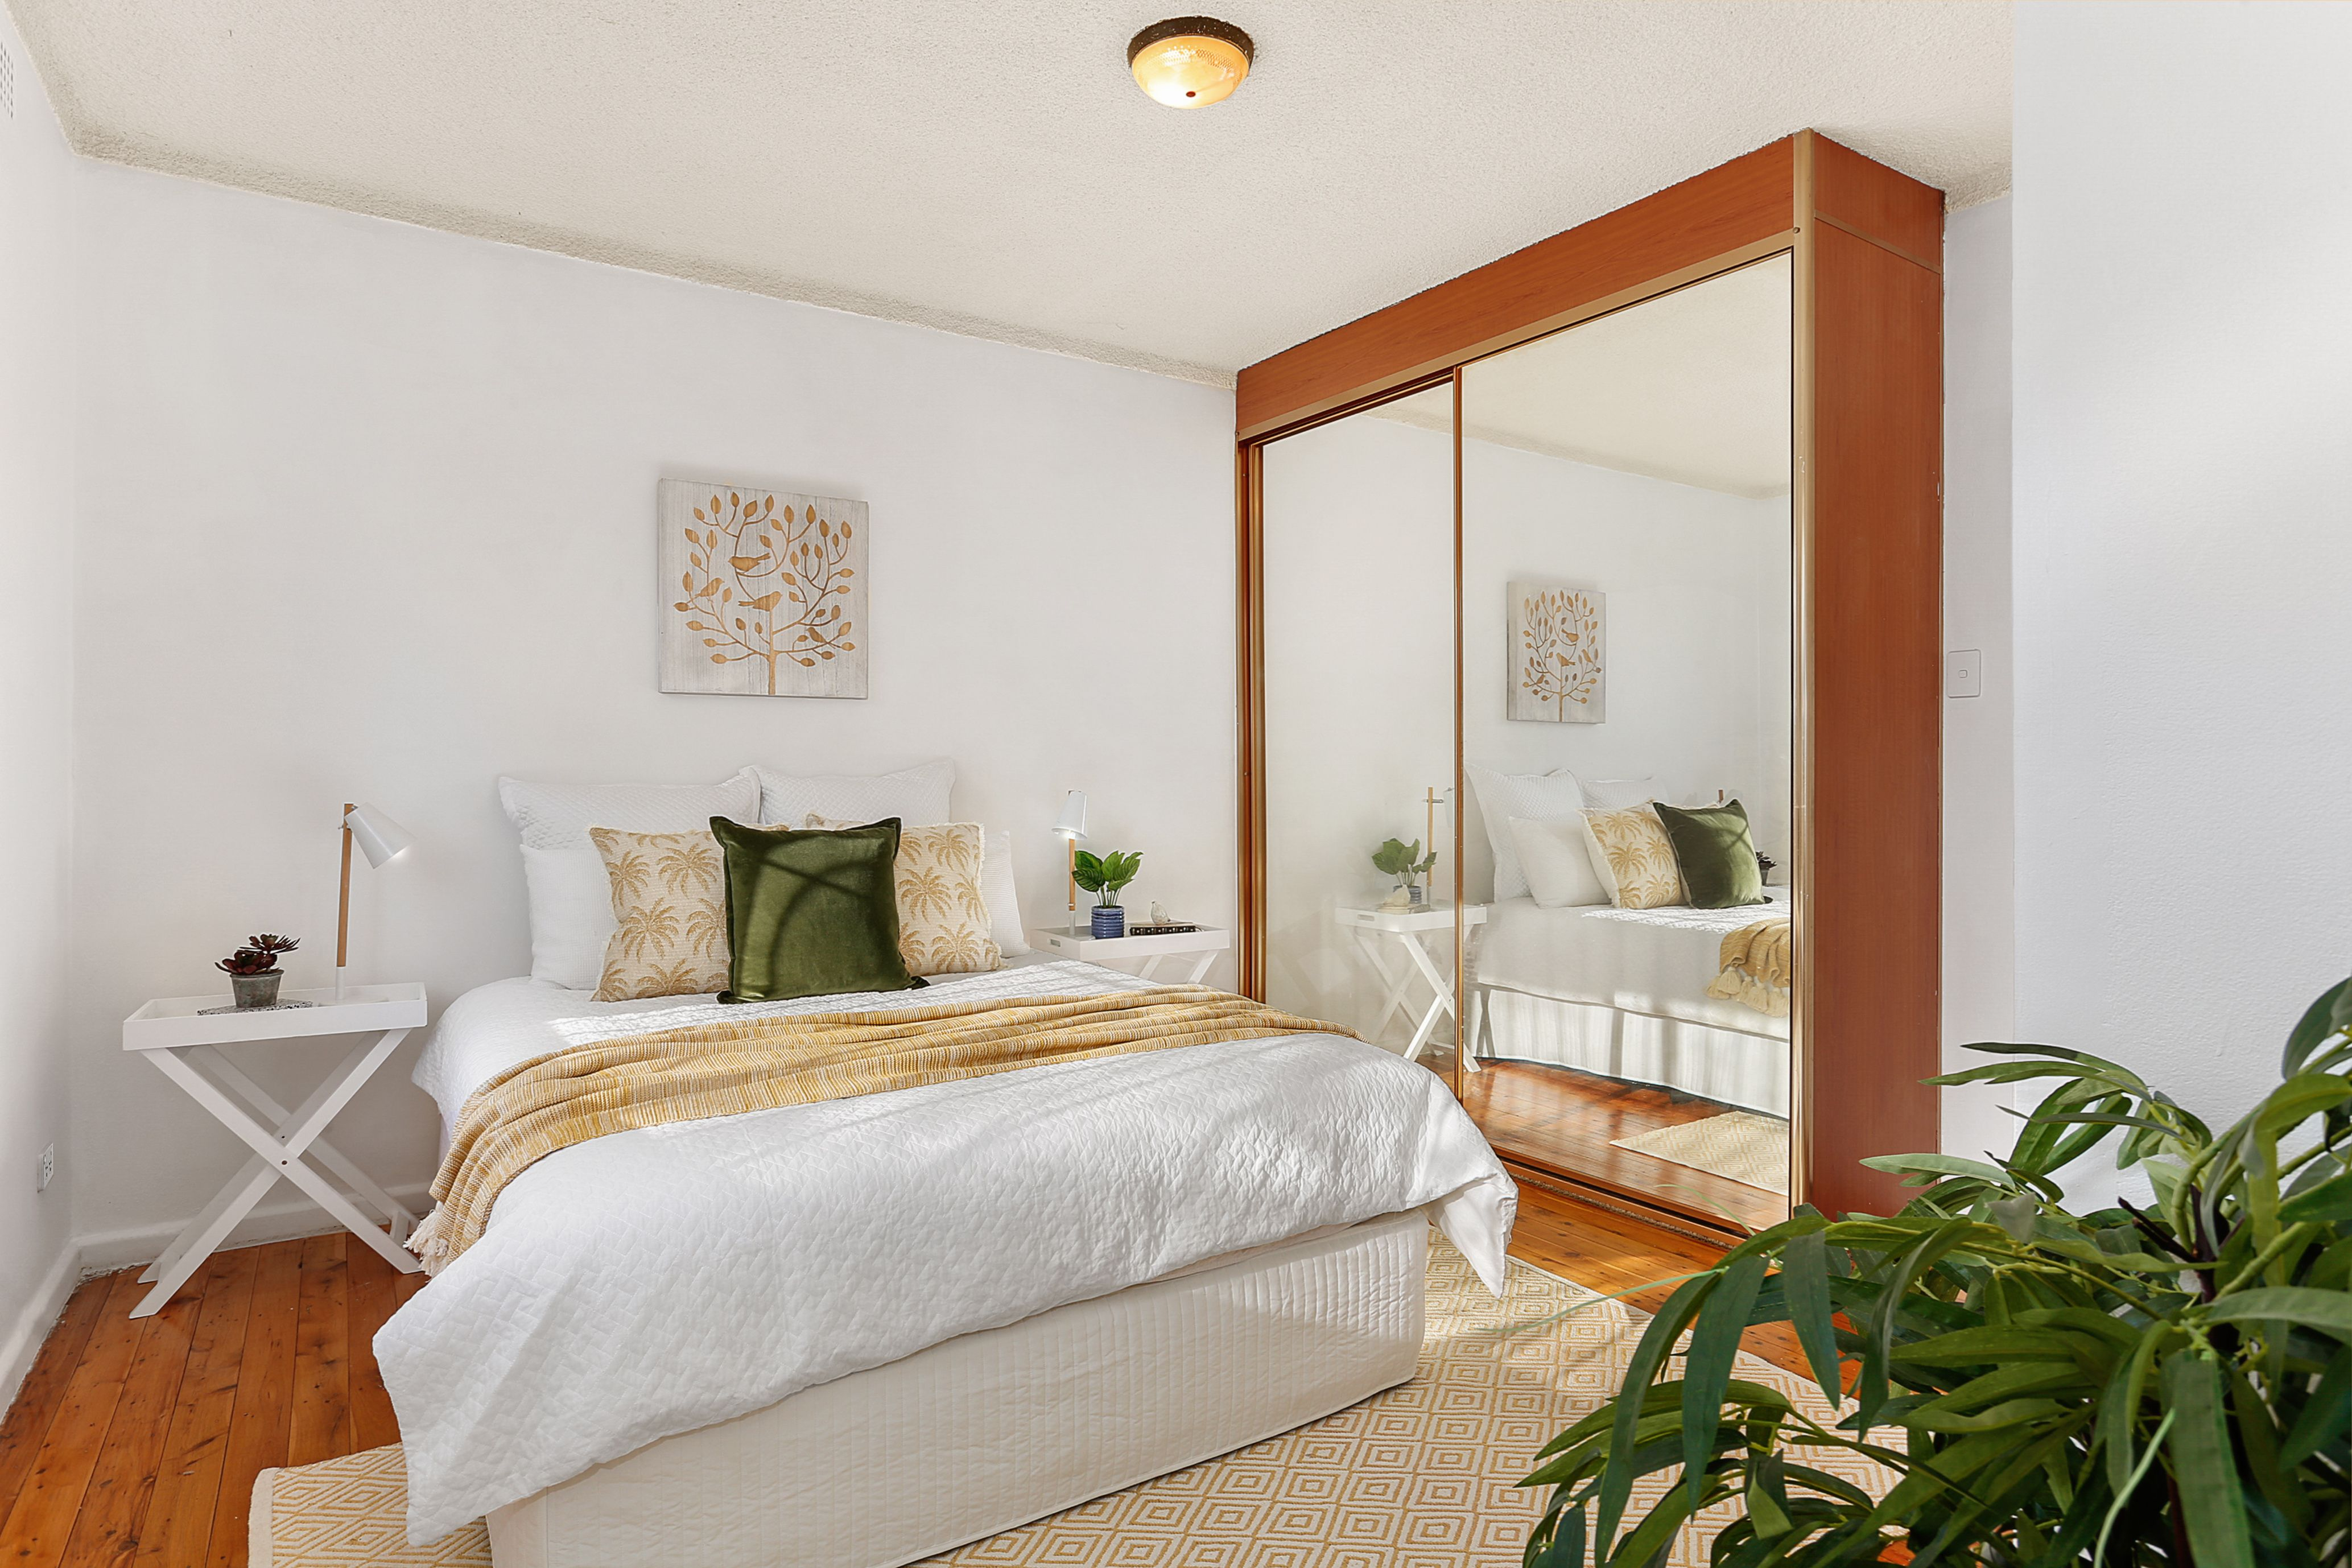 3/121 Lakemba Street, Lakemba NSW 2195